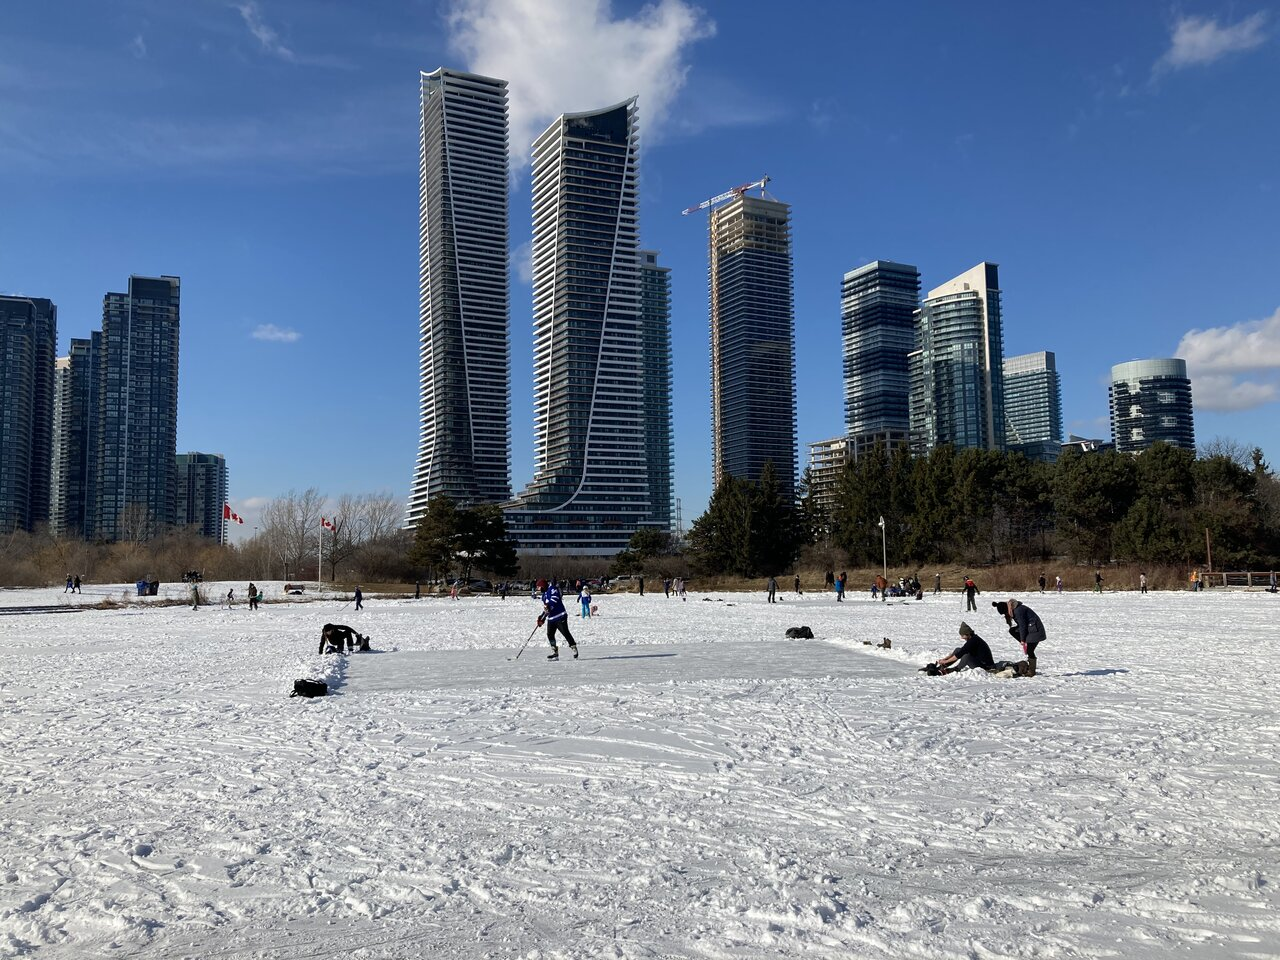 Daily Photo, Toronto, Humber Bay Park, Vita on the Lake